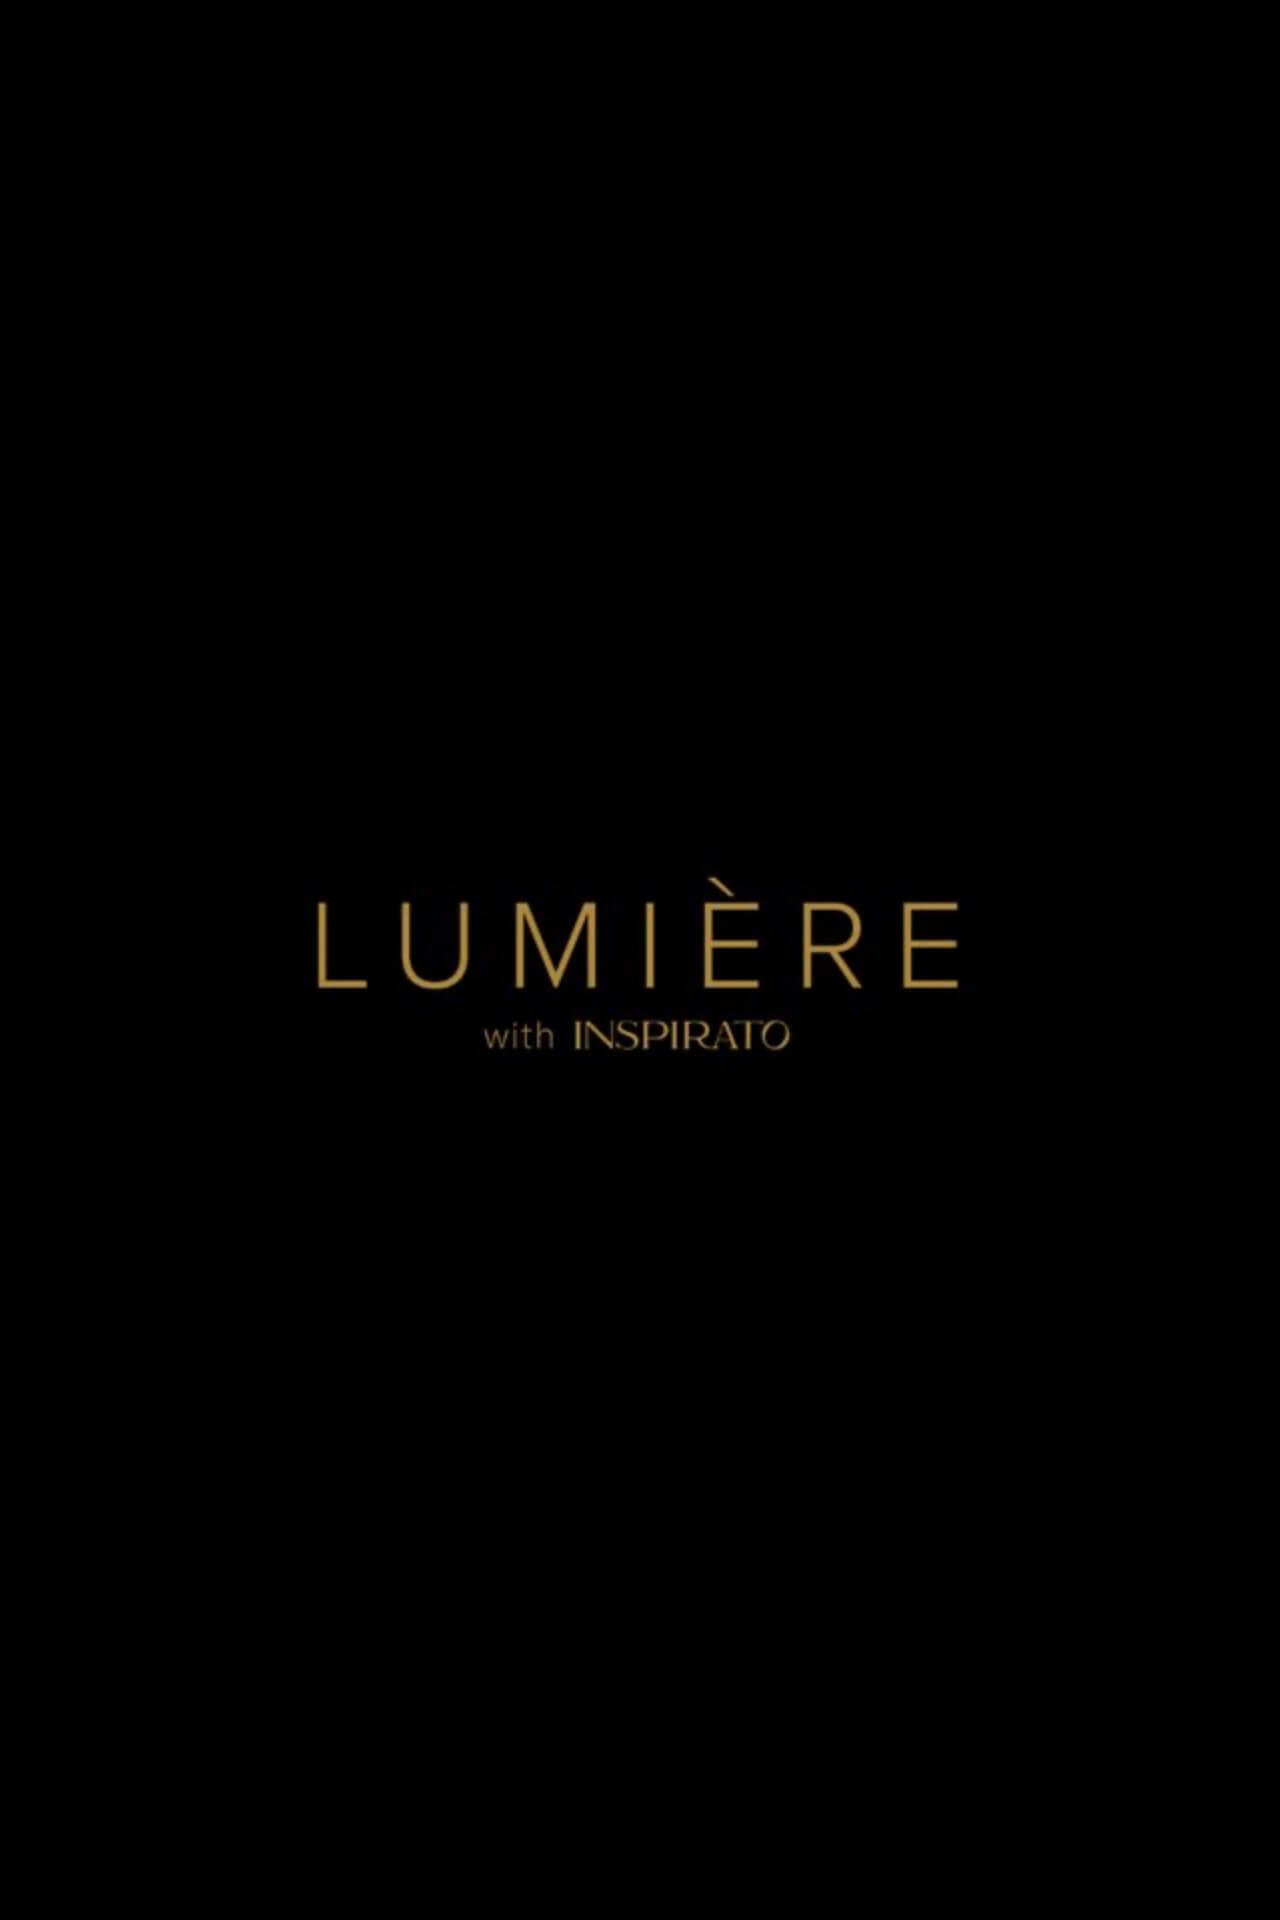 Lumiere With Inspirato